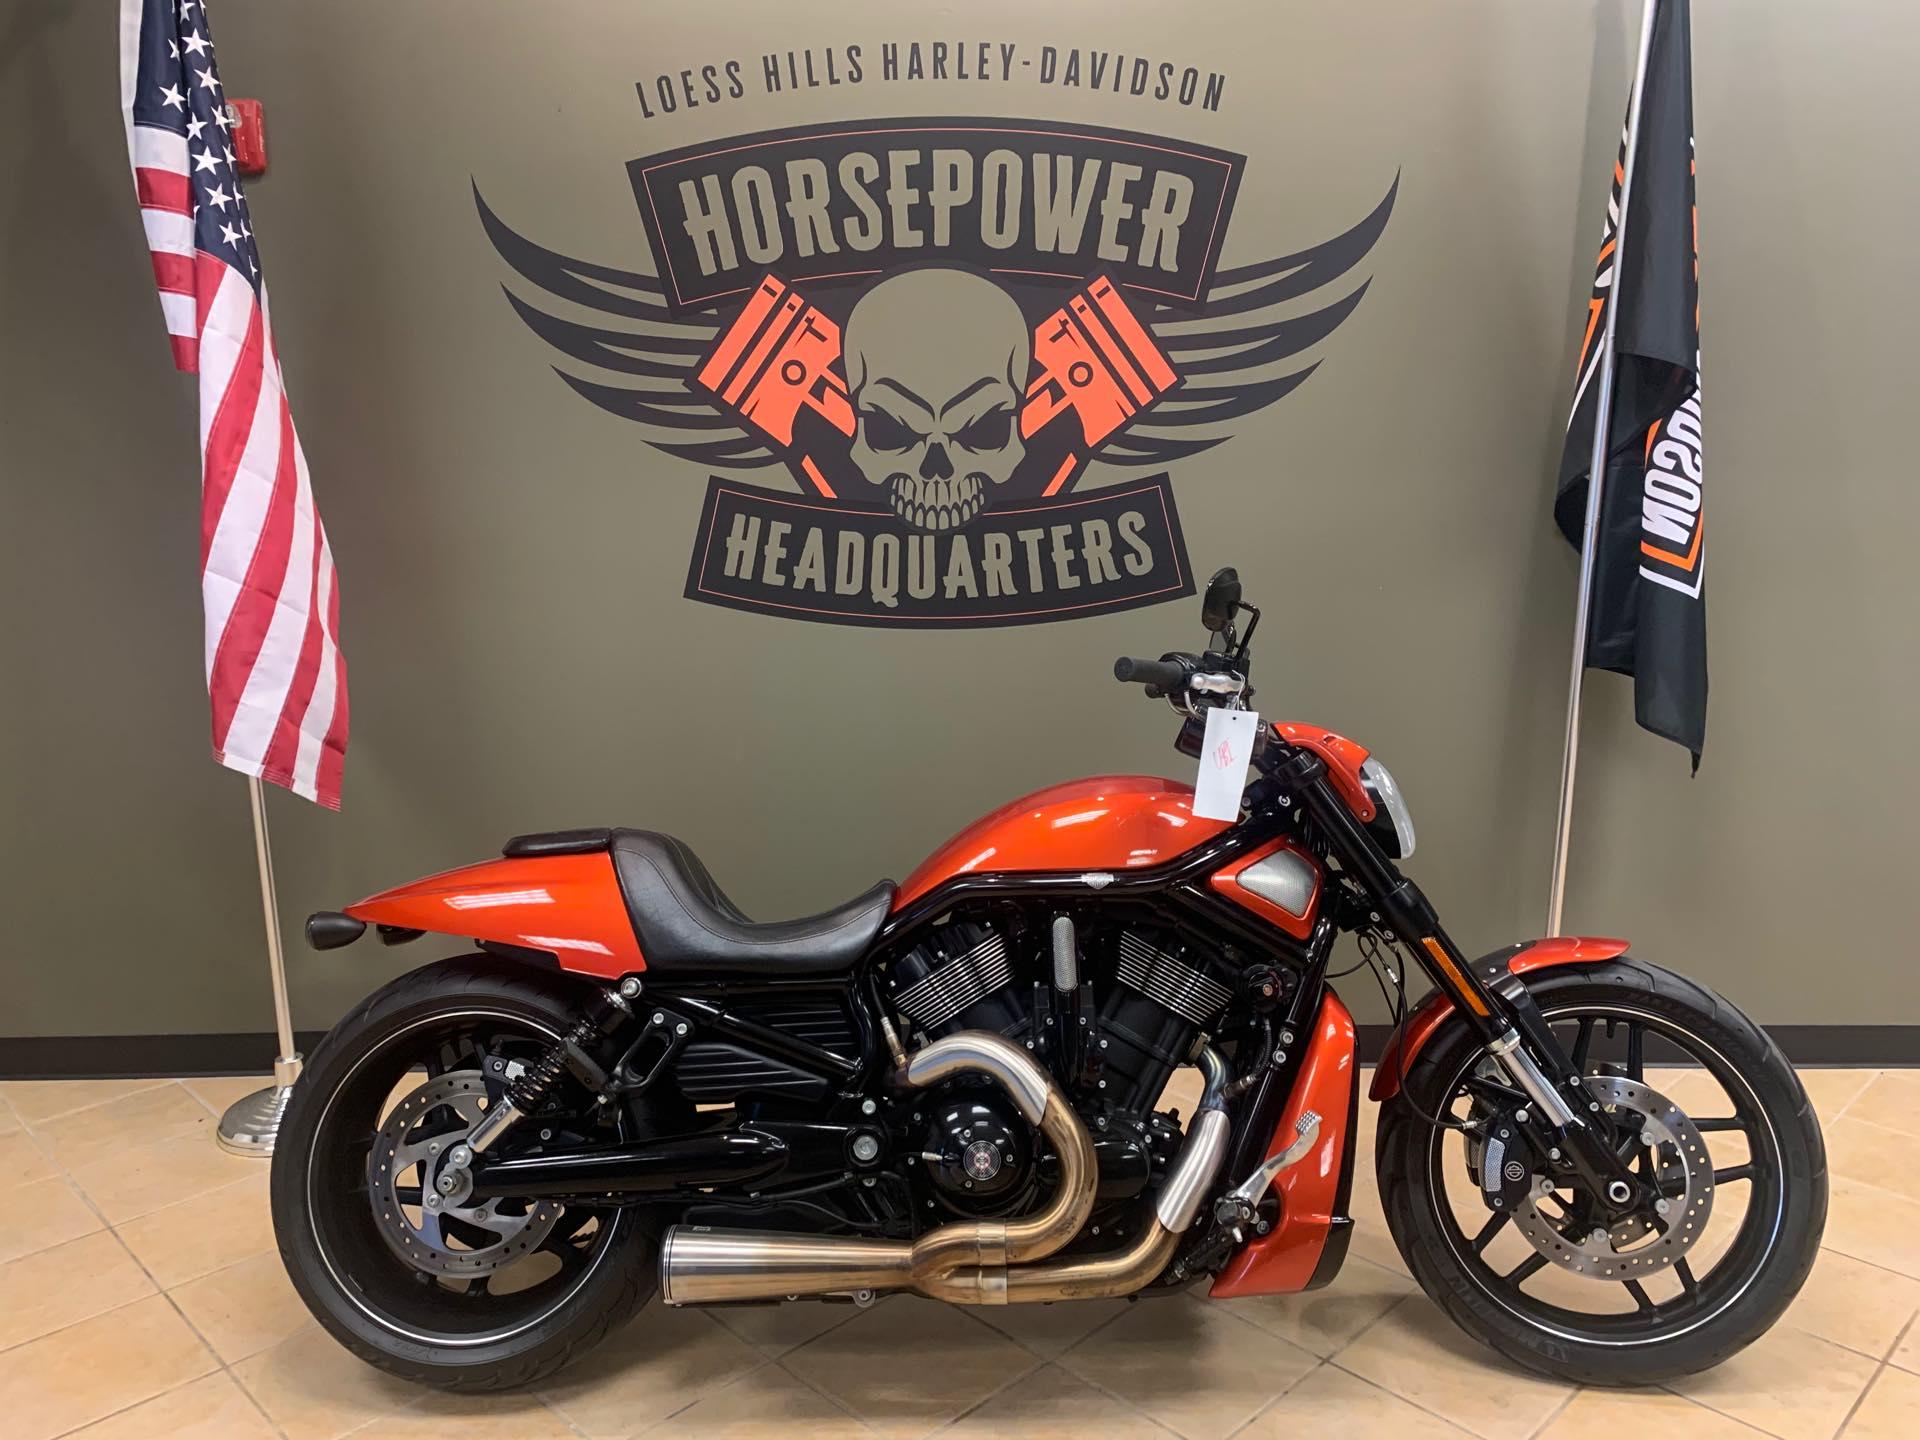 2014 Harley-Davidson V-Rod Night Rod Special at Loess Hills Harley-Davidson